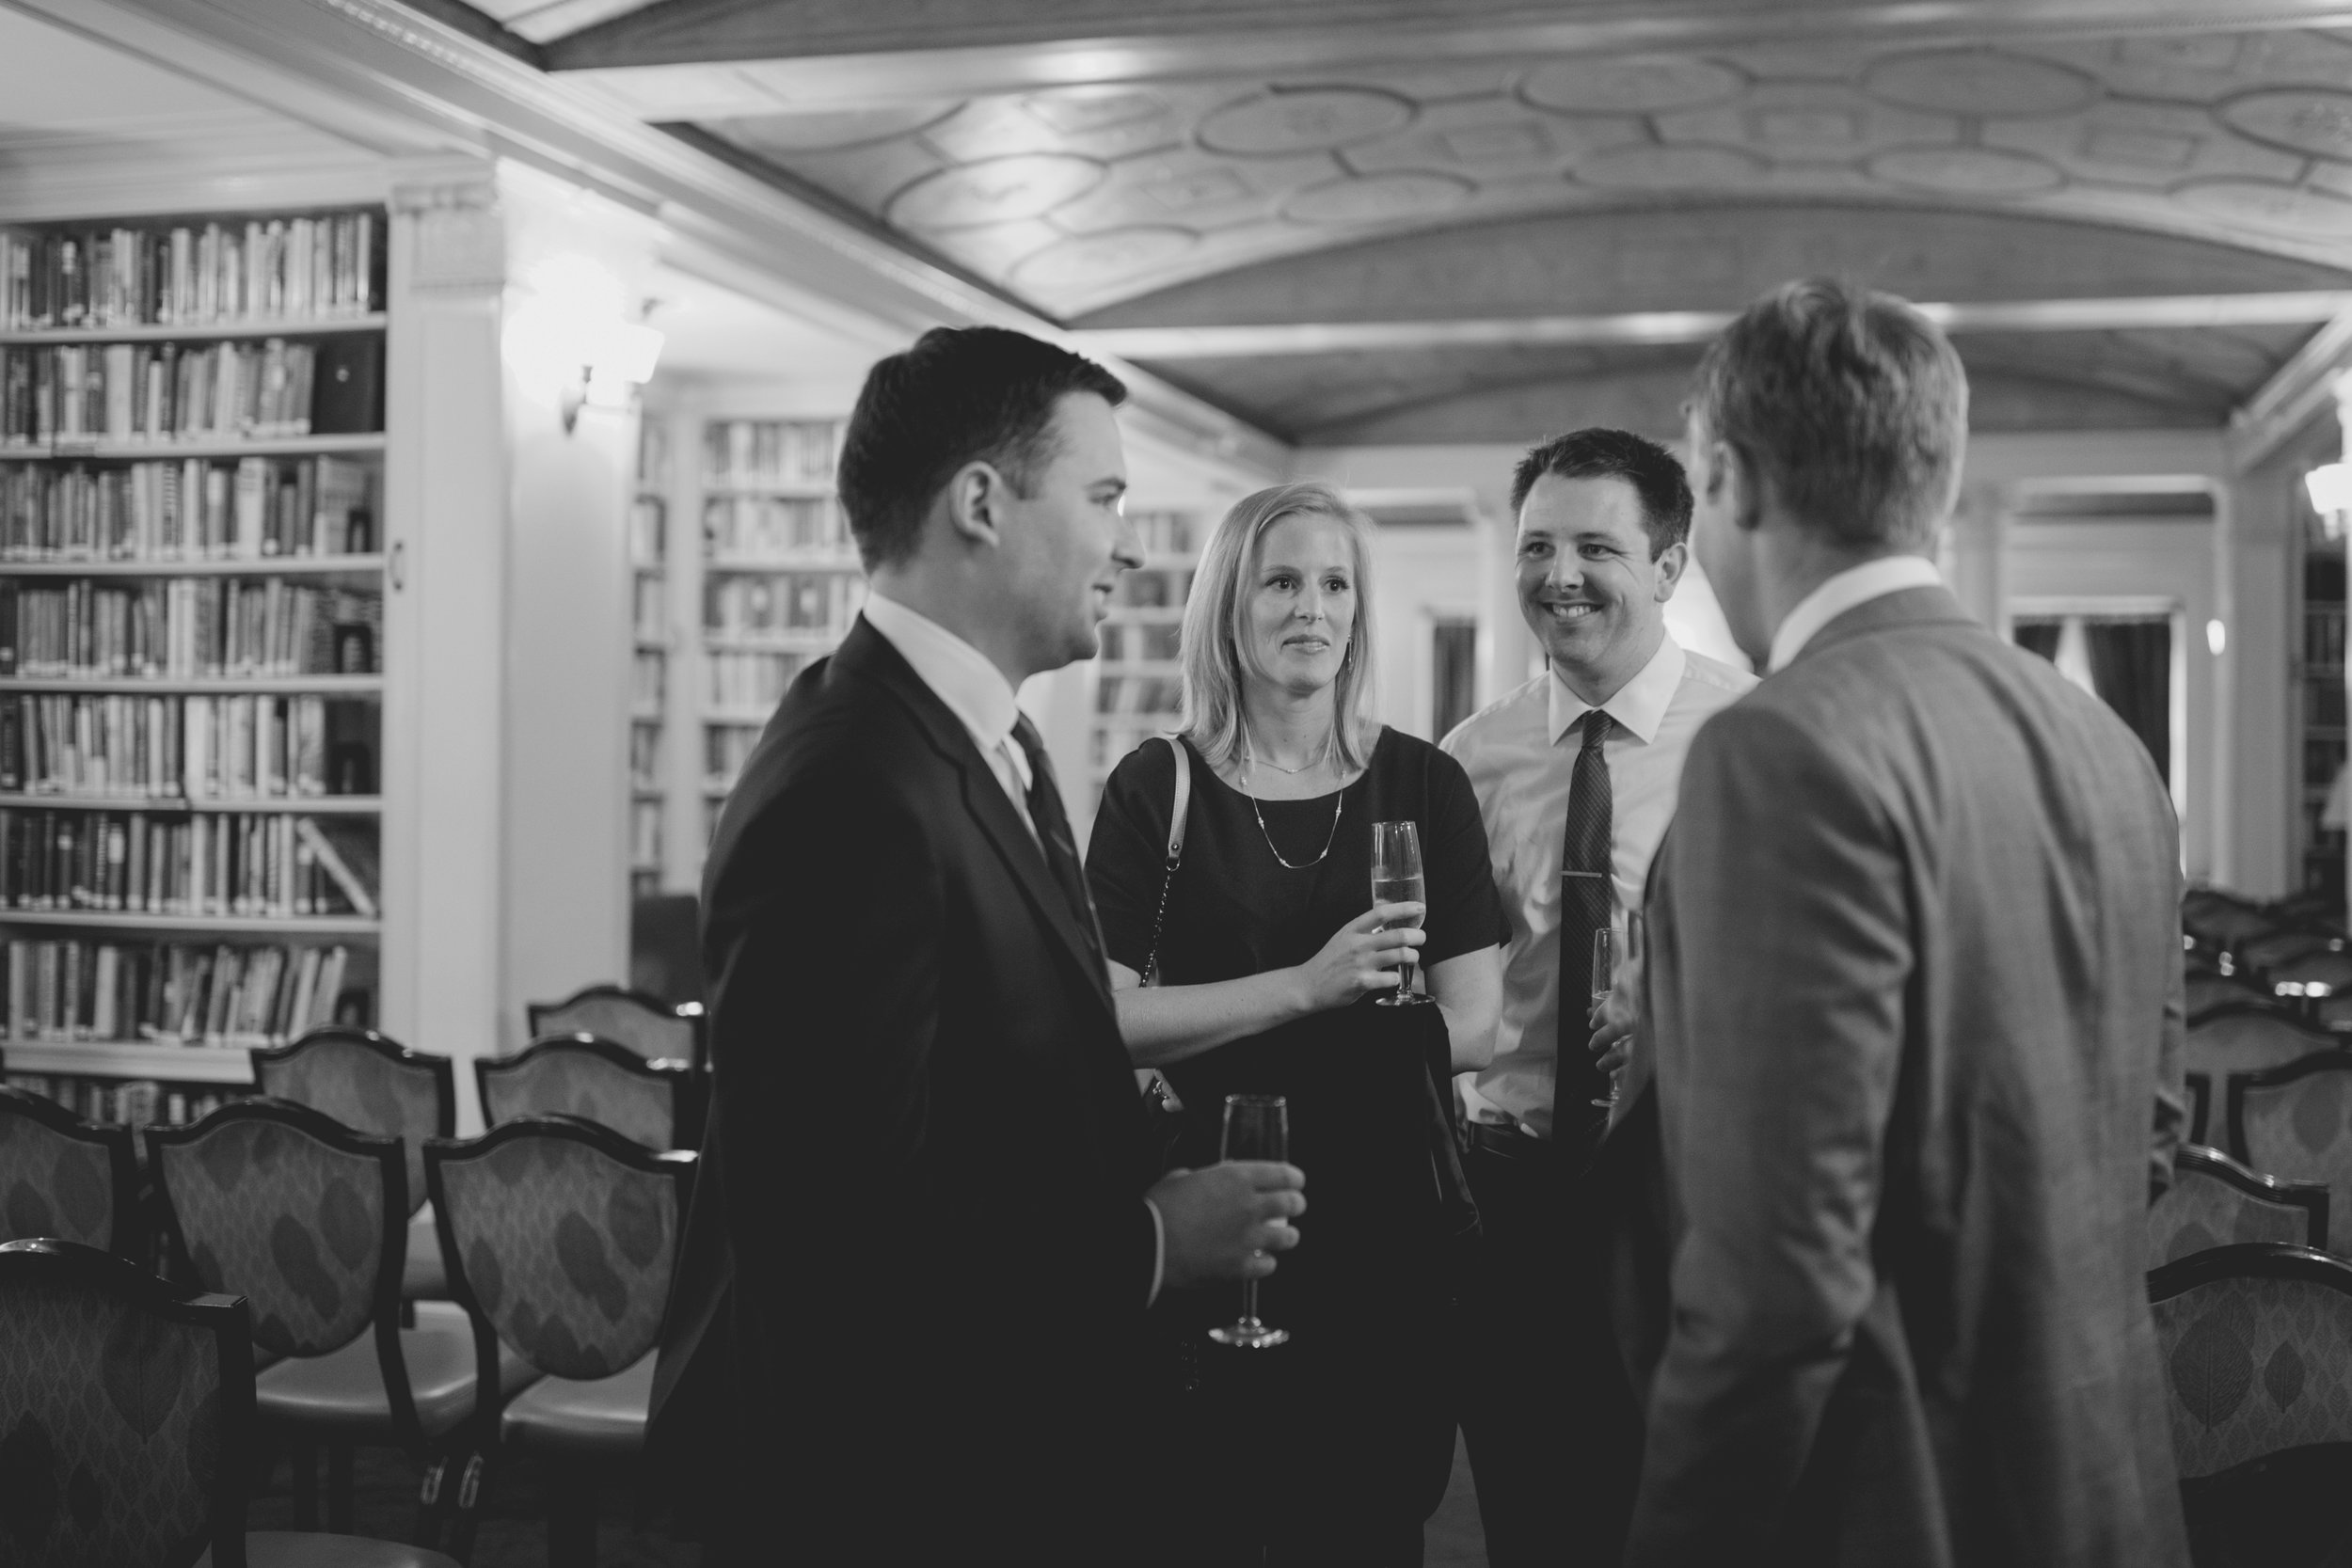 amanda_vanvels_new_york_lgbtq_gay_wedding_018.jpg